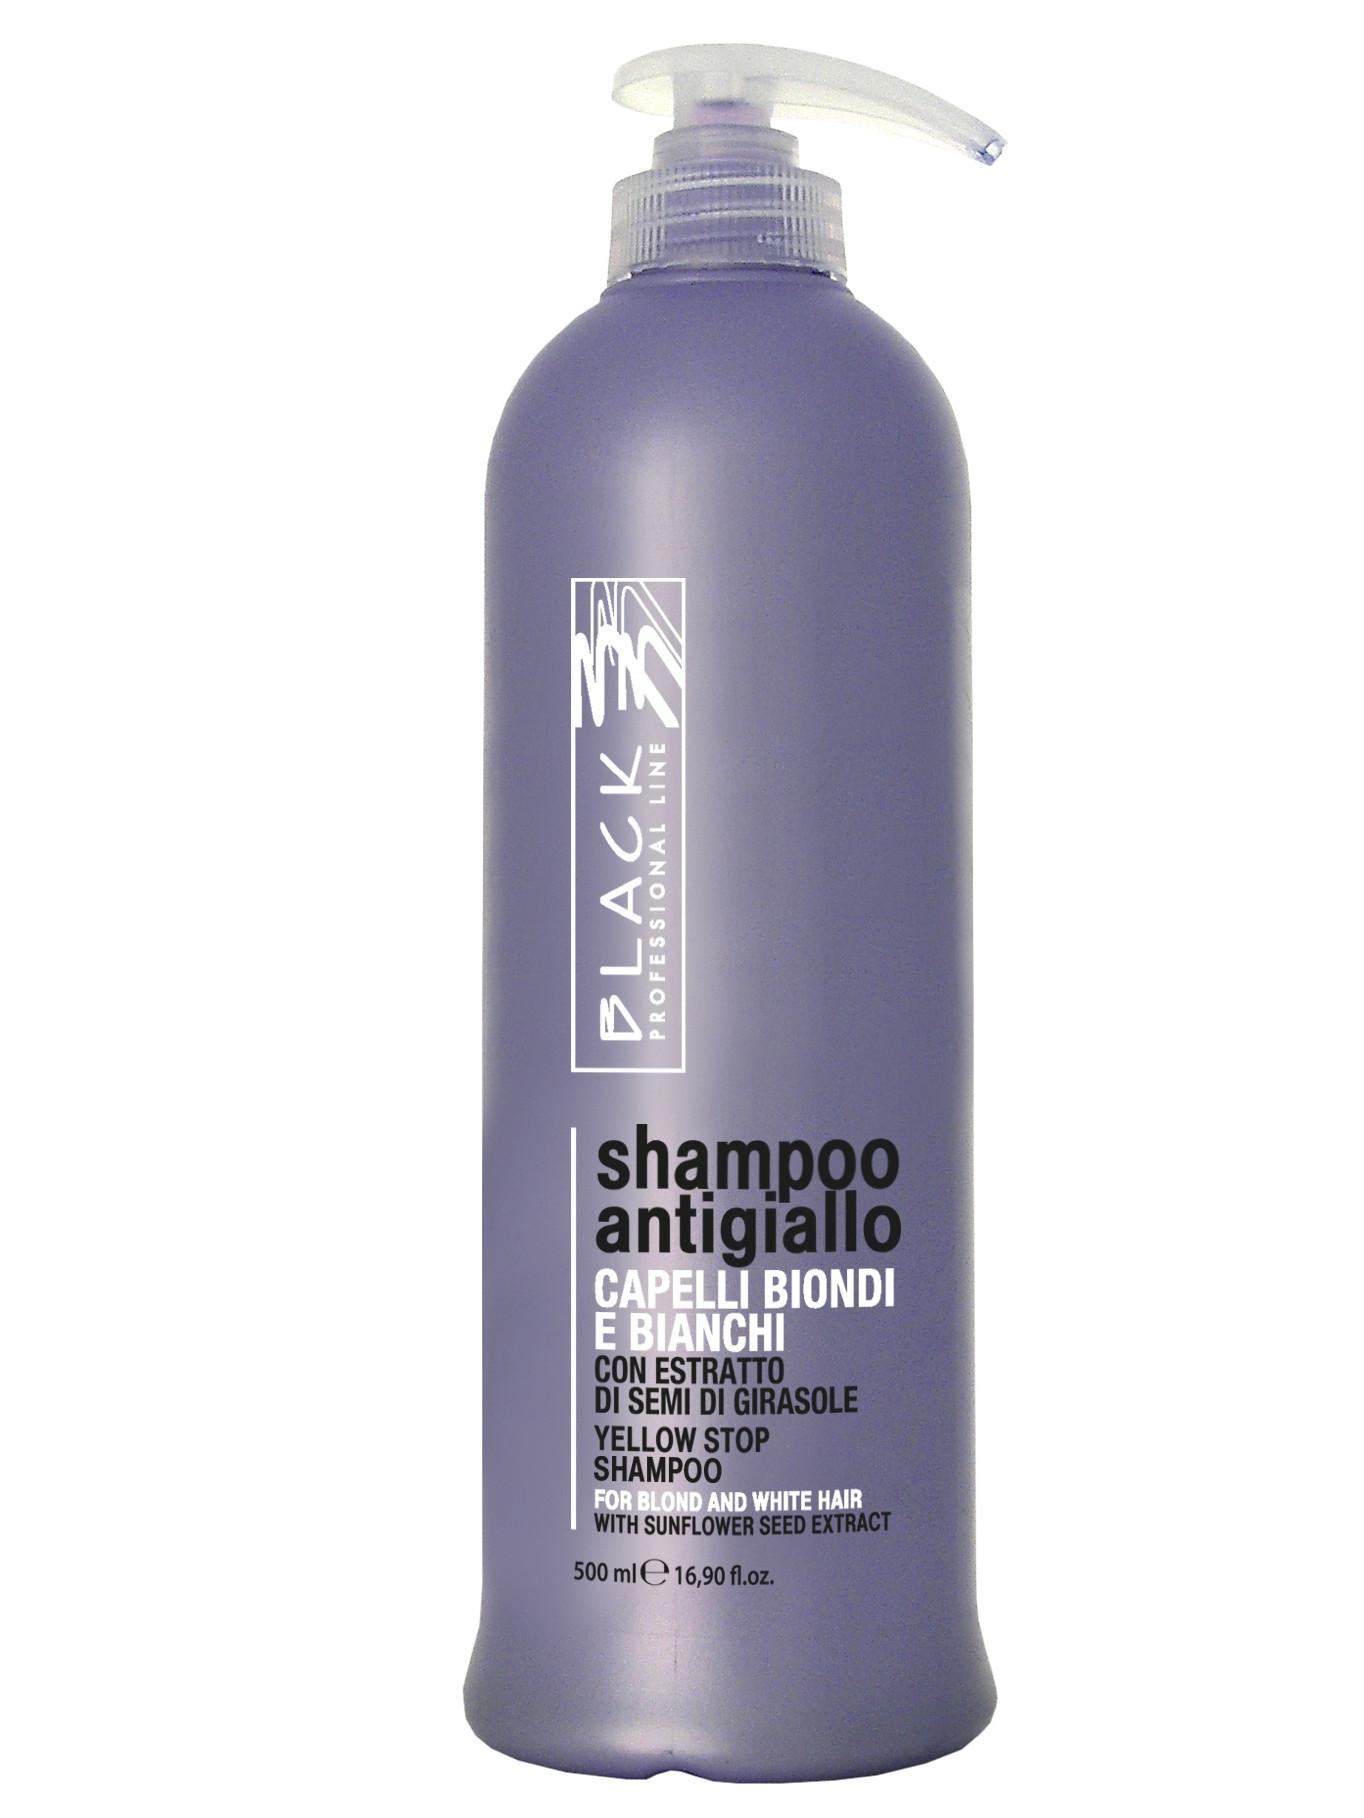 Šampon pro blond a melírované vlasy Black Yellow Stop - 500 ml (01097)